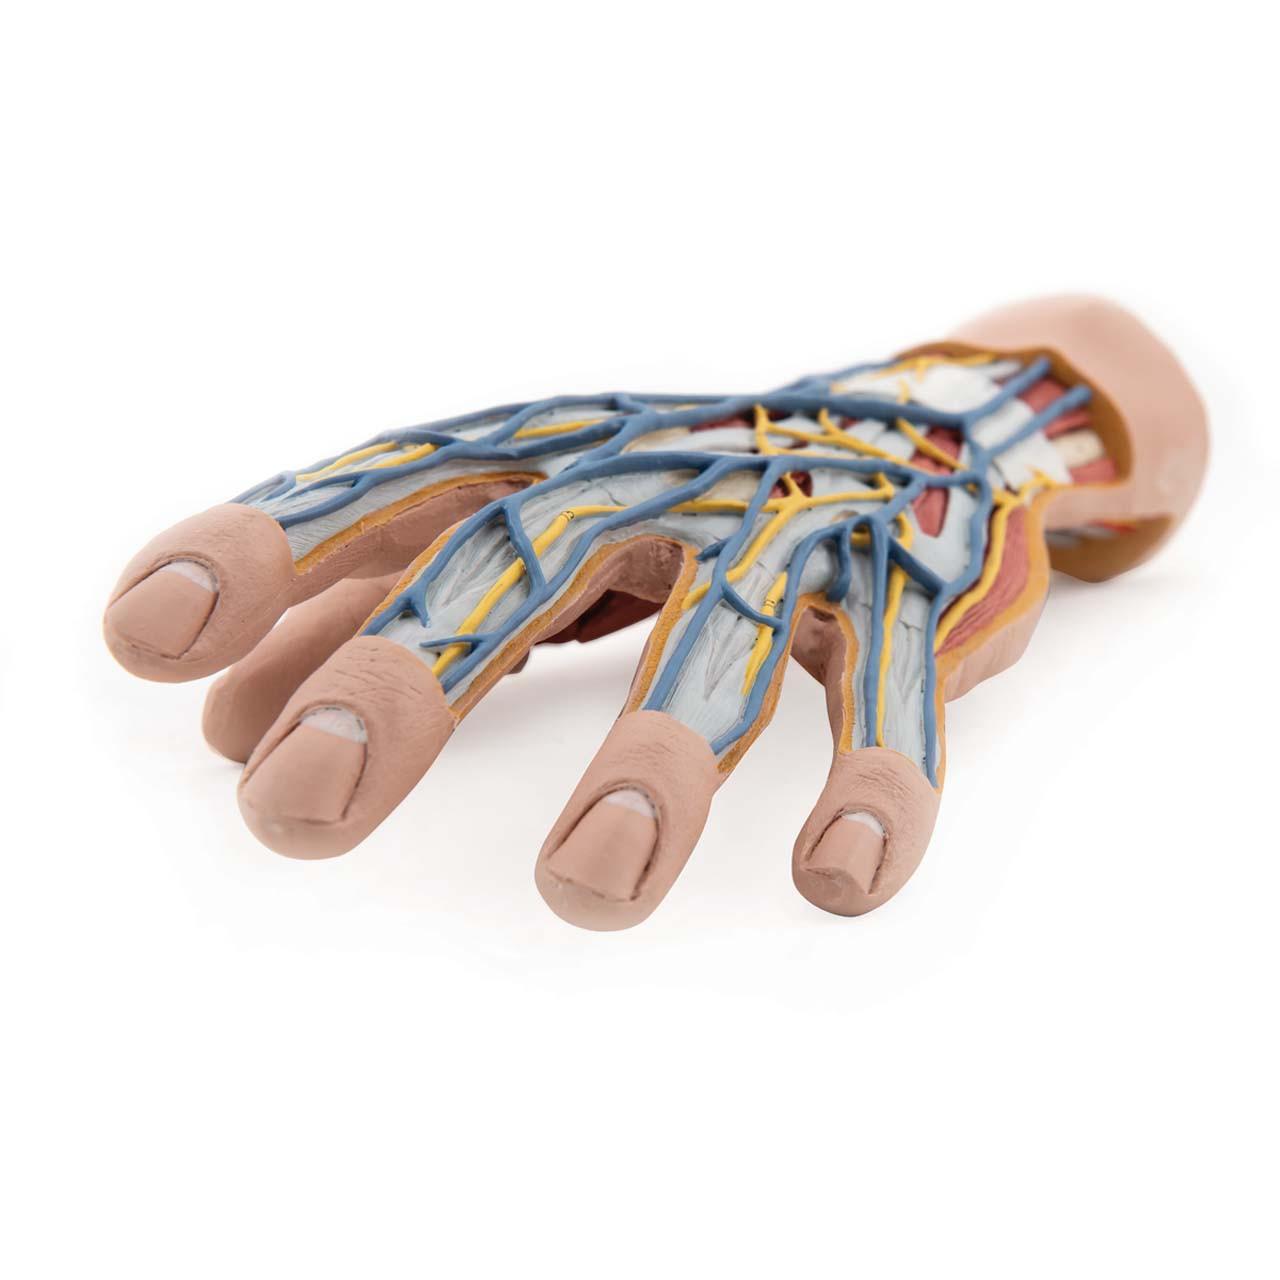 Internal Hand Structure Model, 3 part